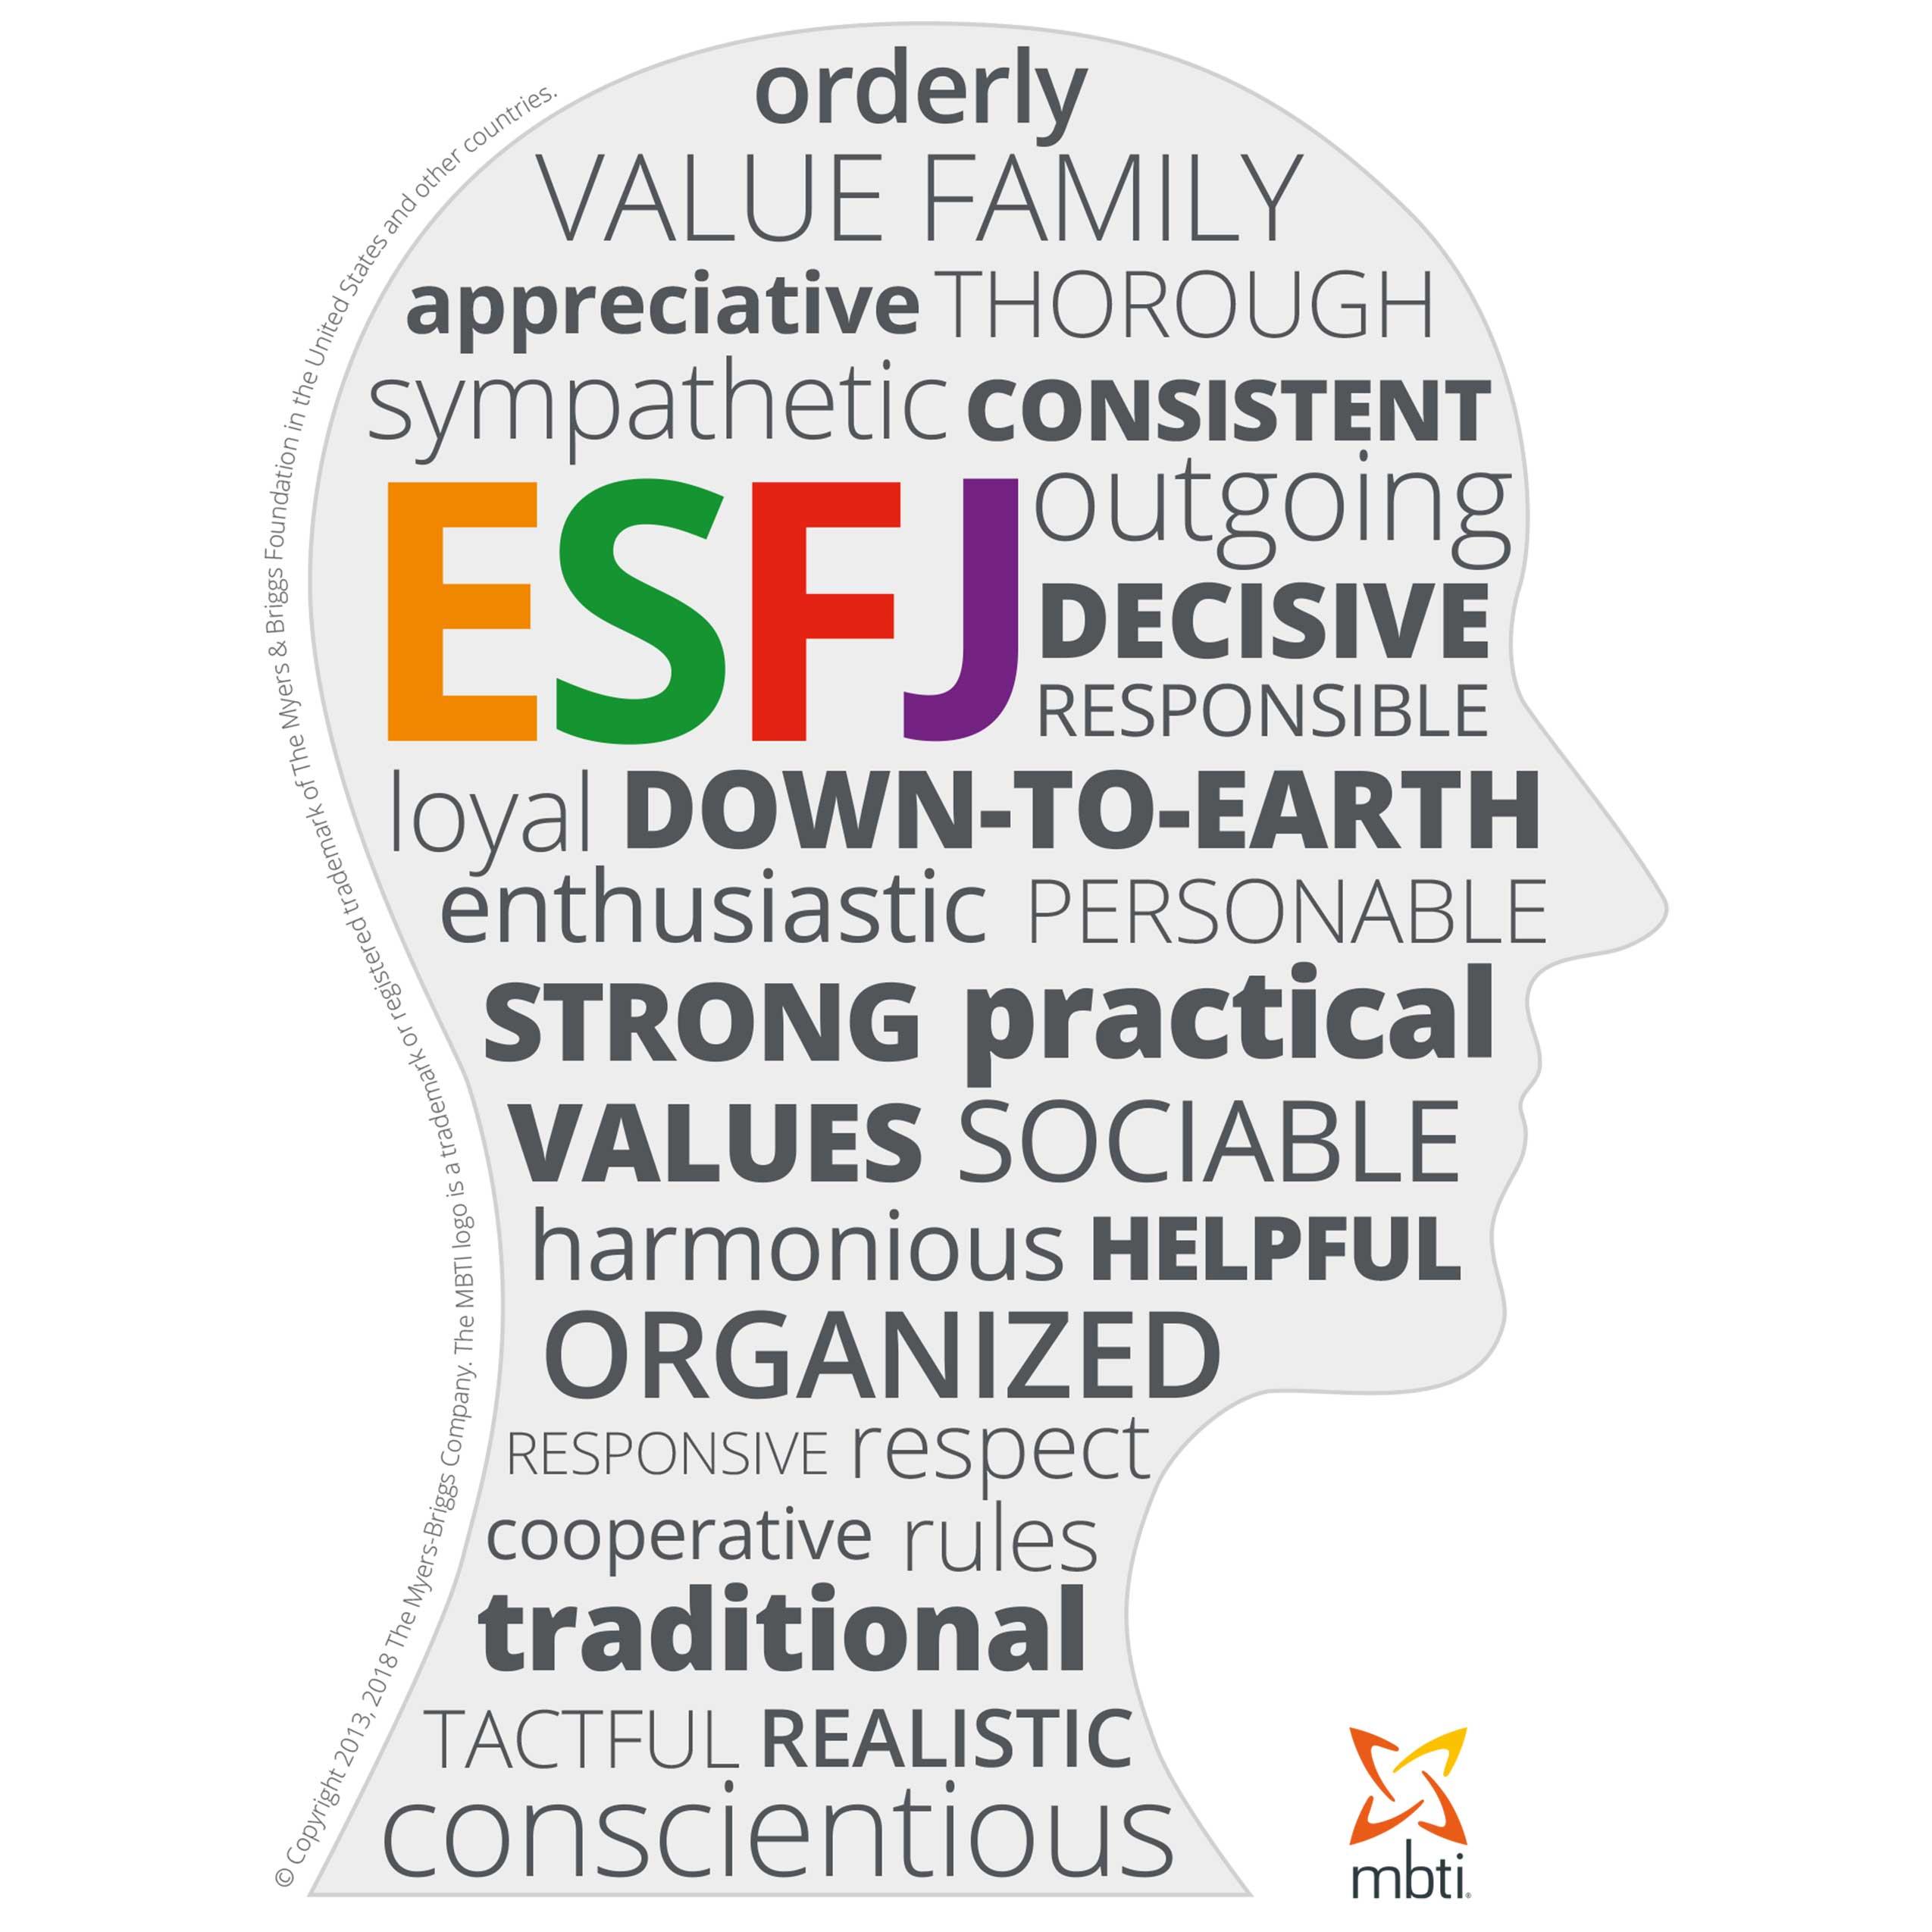 MBTI Myers-Briggs Personality Type Characteristics ESFJ